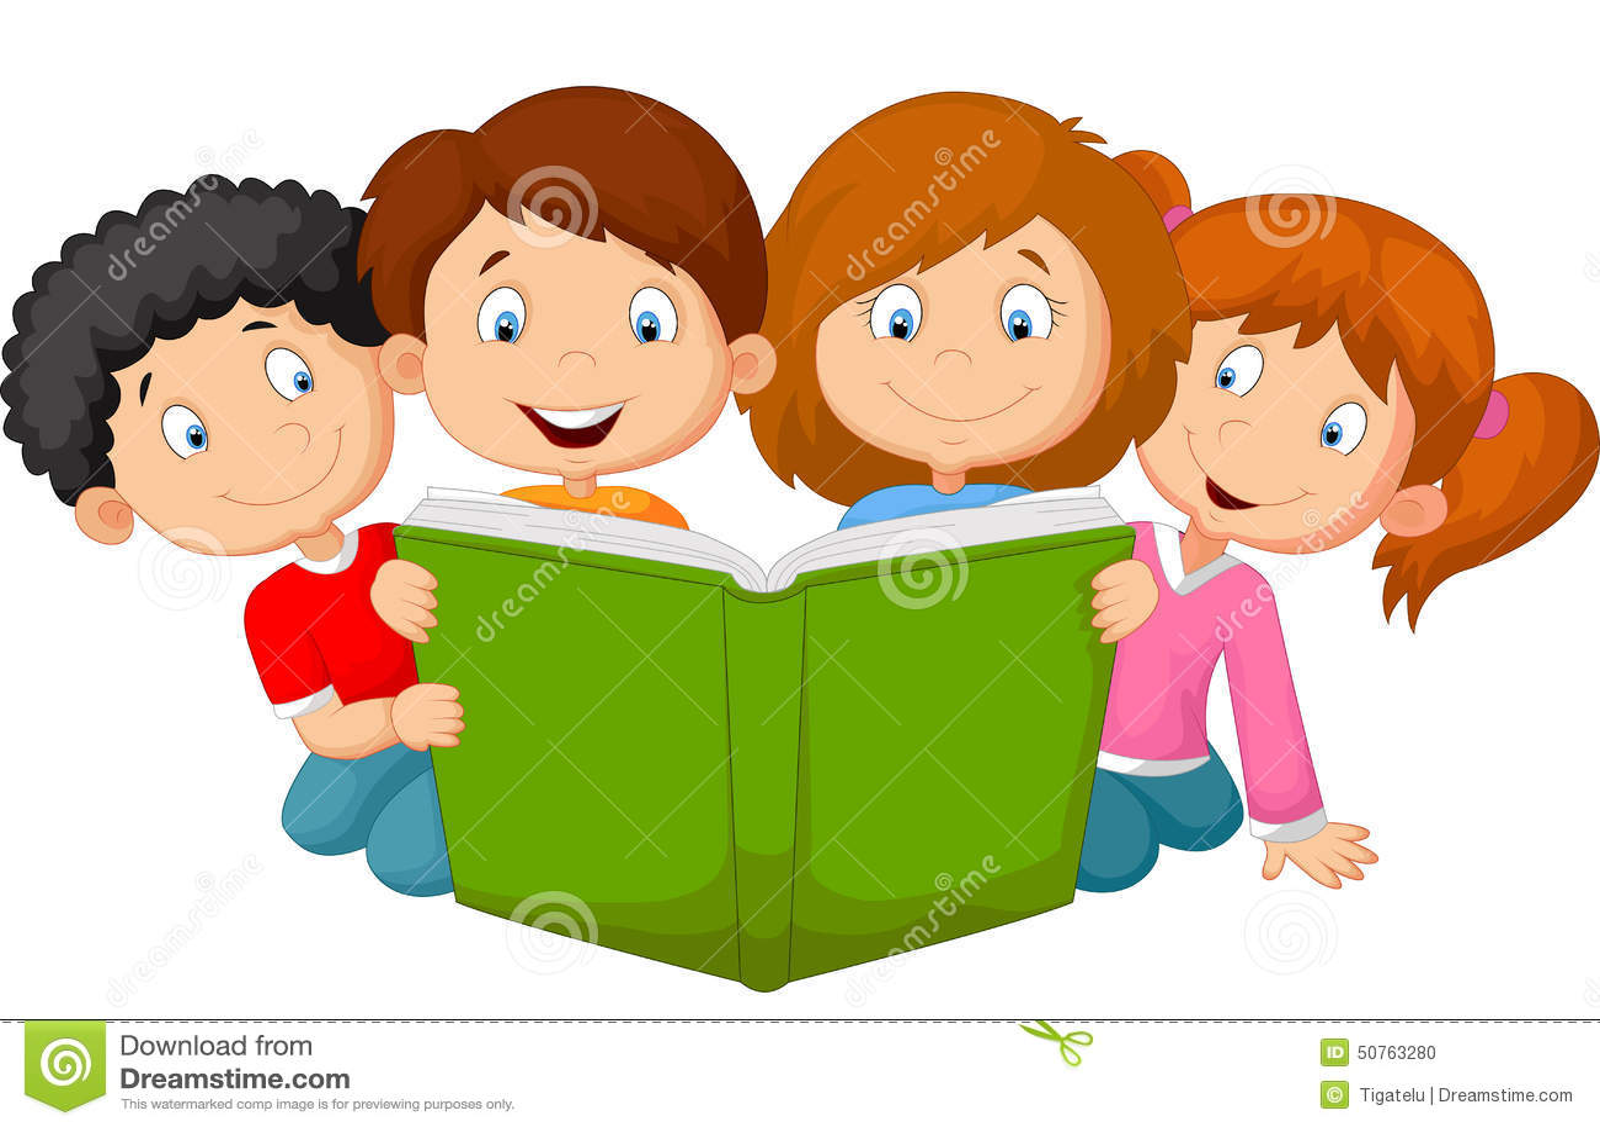 La historieta embroma el libro de lectura